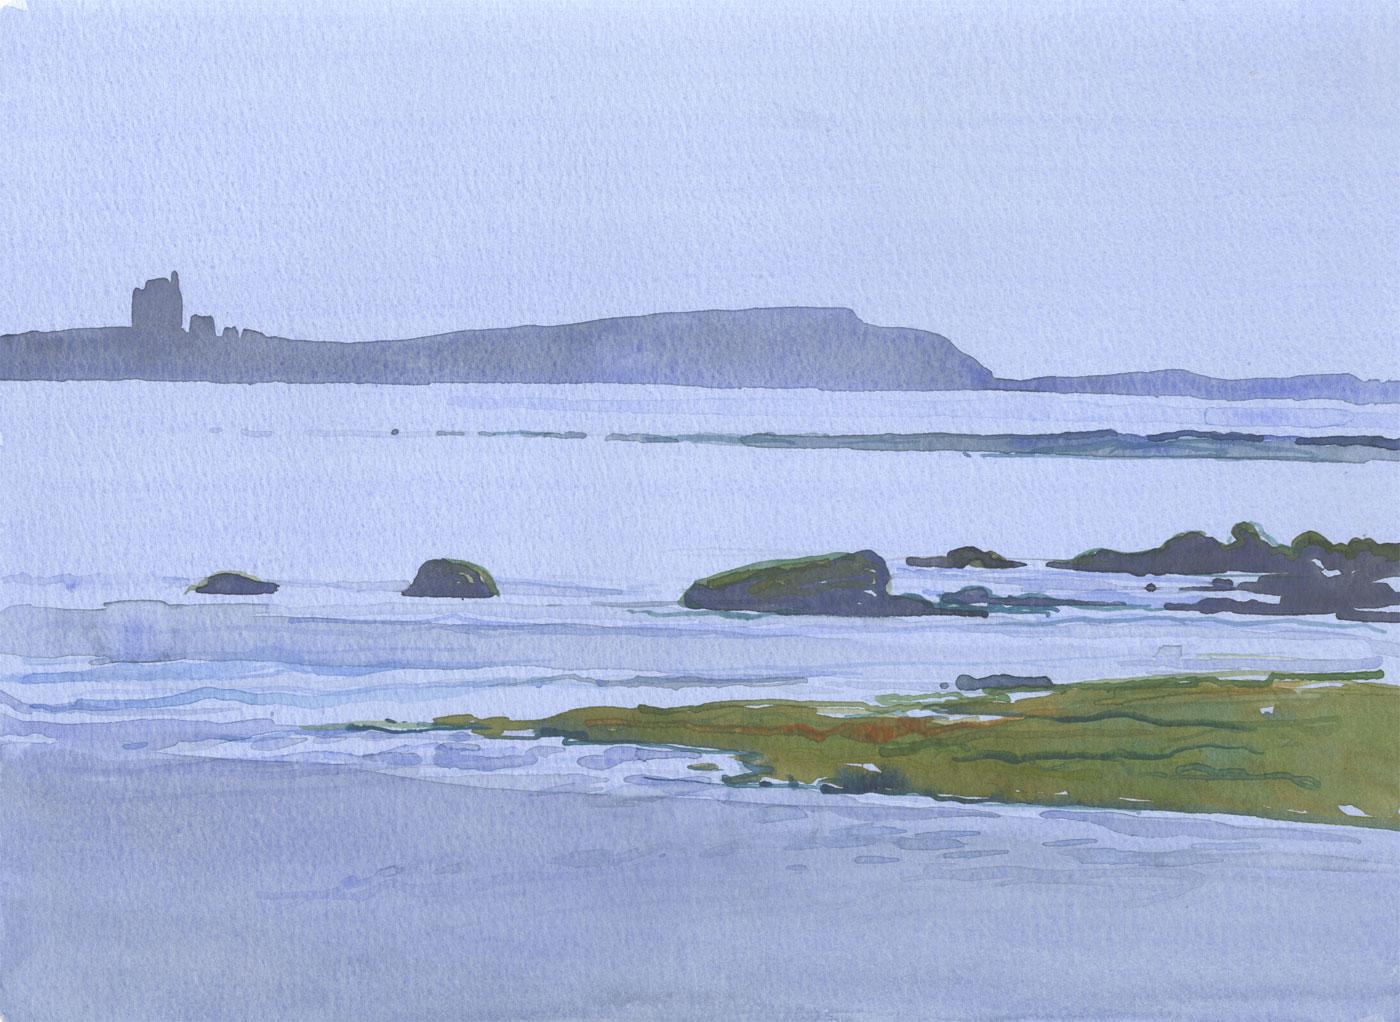 Robert T. Blayney (1929-2016) - Mid 20th Century Watercolour, Calm Seas